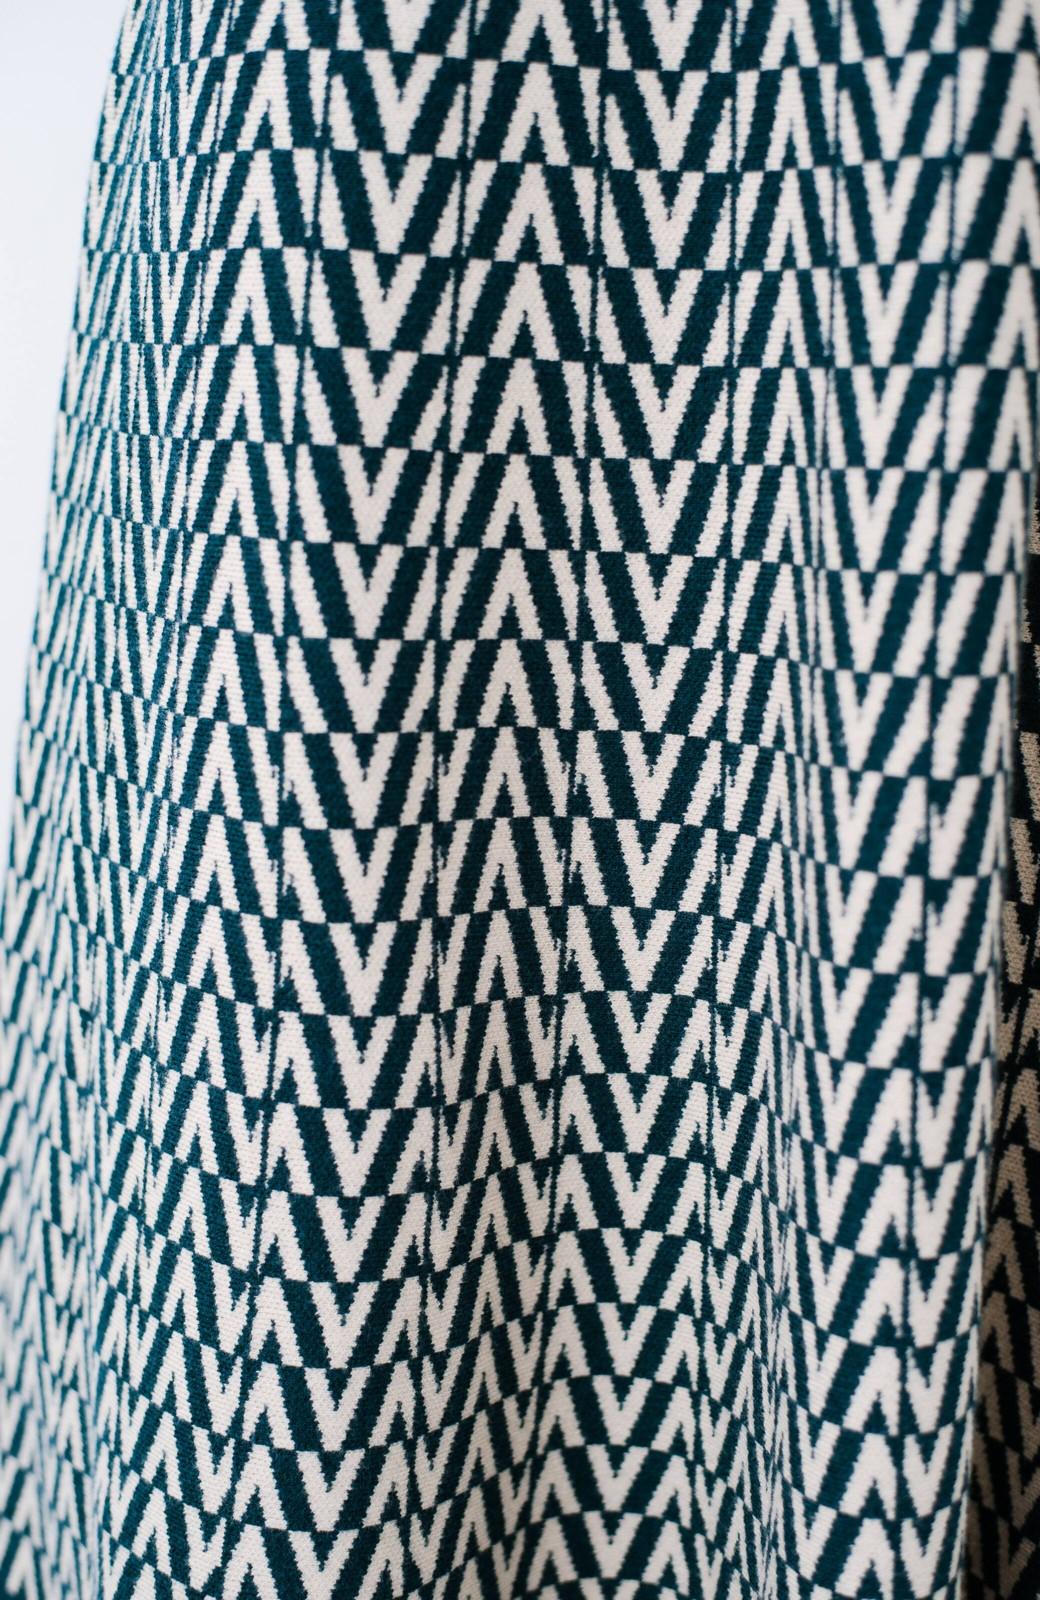 haco! シンプルトップスと合わせるだけでコーデがオシャレ&華やかになる ジャカードニットスカート <グリーン系その他>の商品写真8